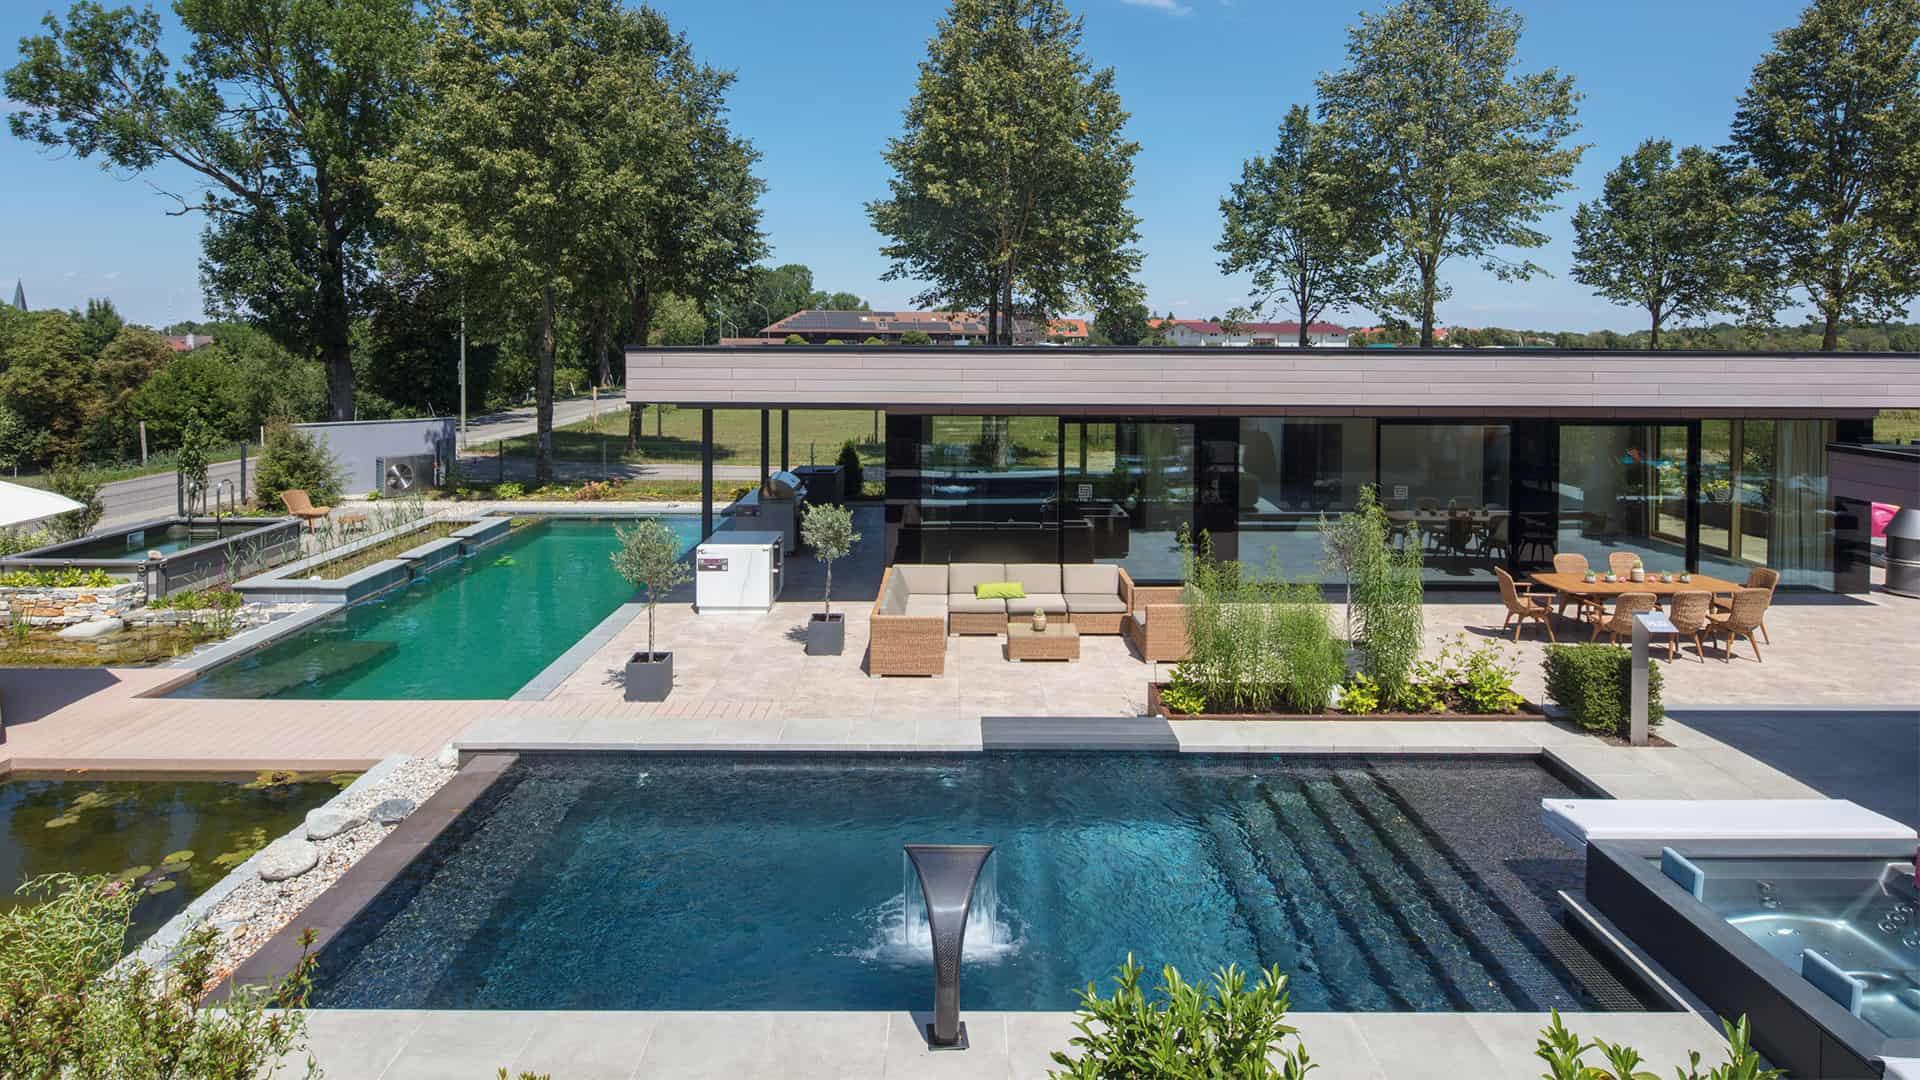 rivierapool poolbau hofquartier einrichtung. Black Bedroom Furniture Sets. Home Design Ideas